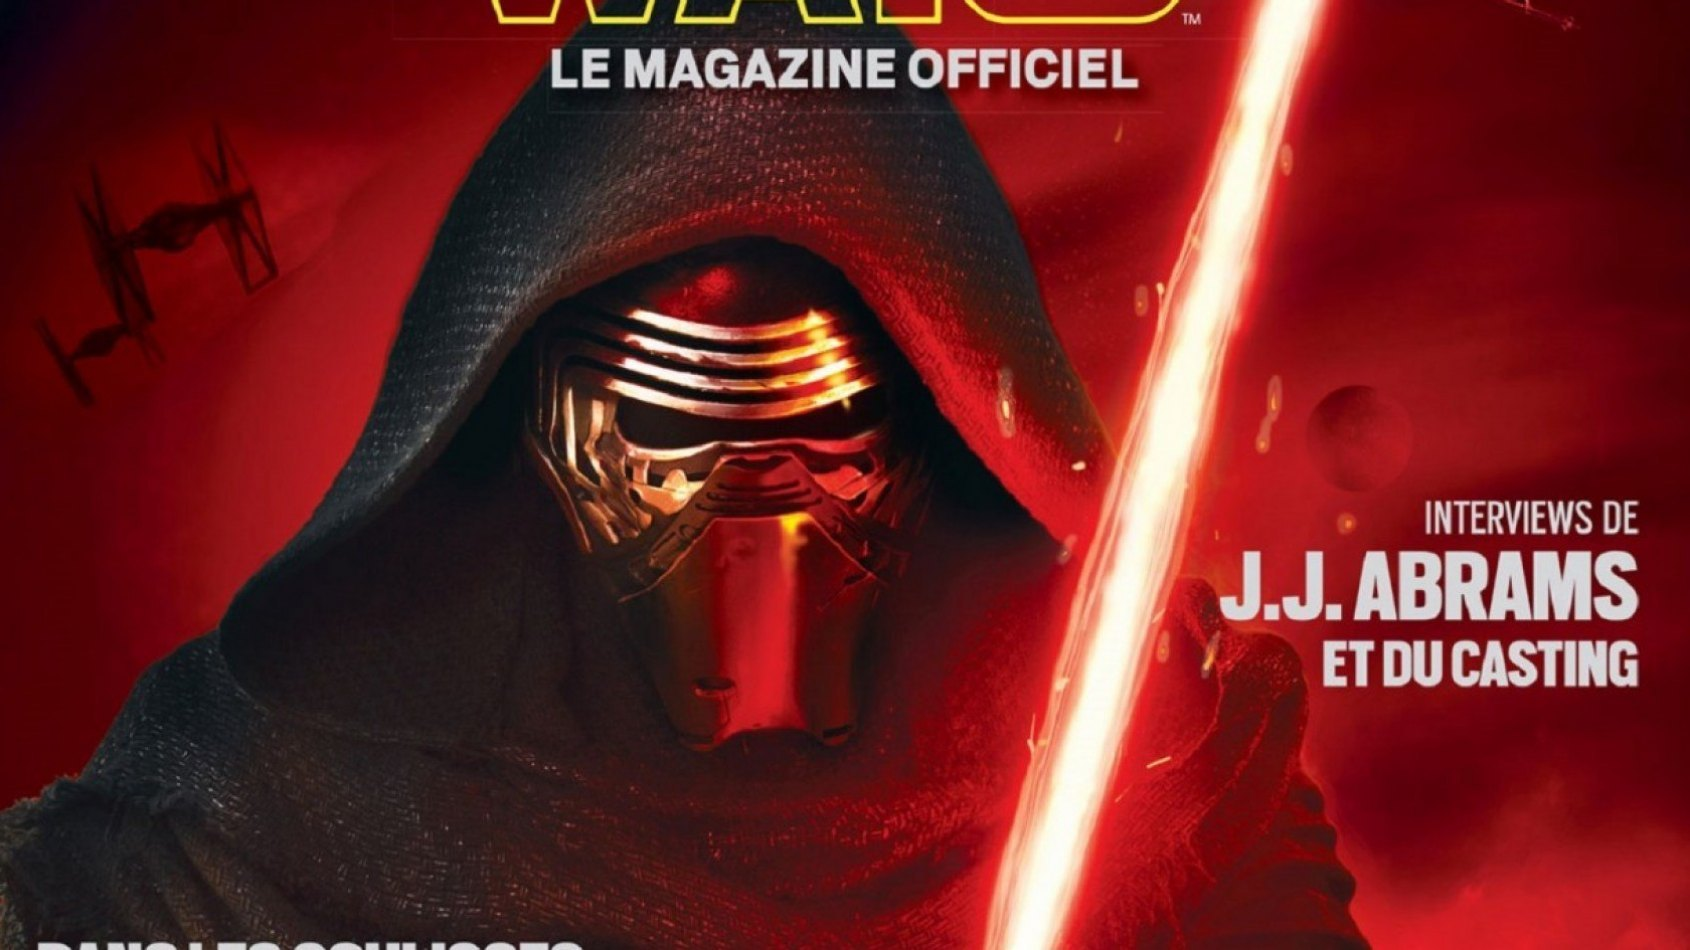 Review : Star Wars Insider n°4 et Star Wars Insider hors-série